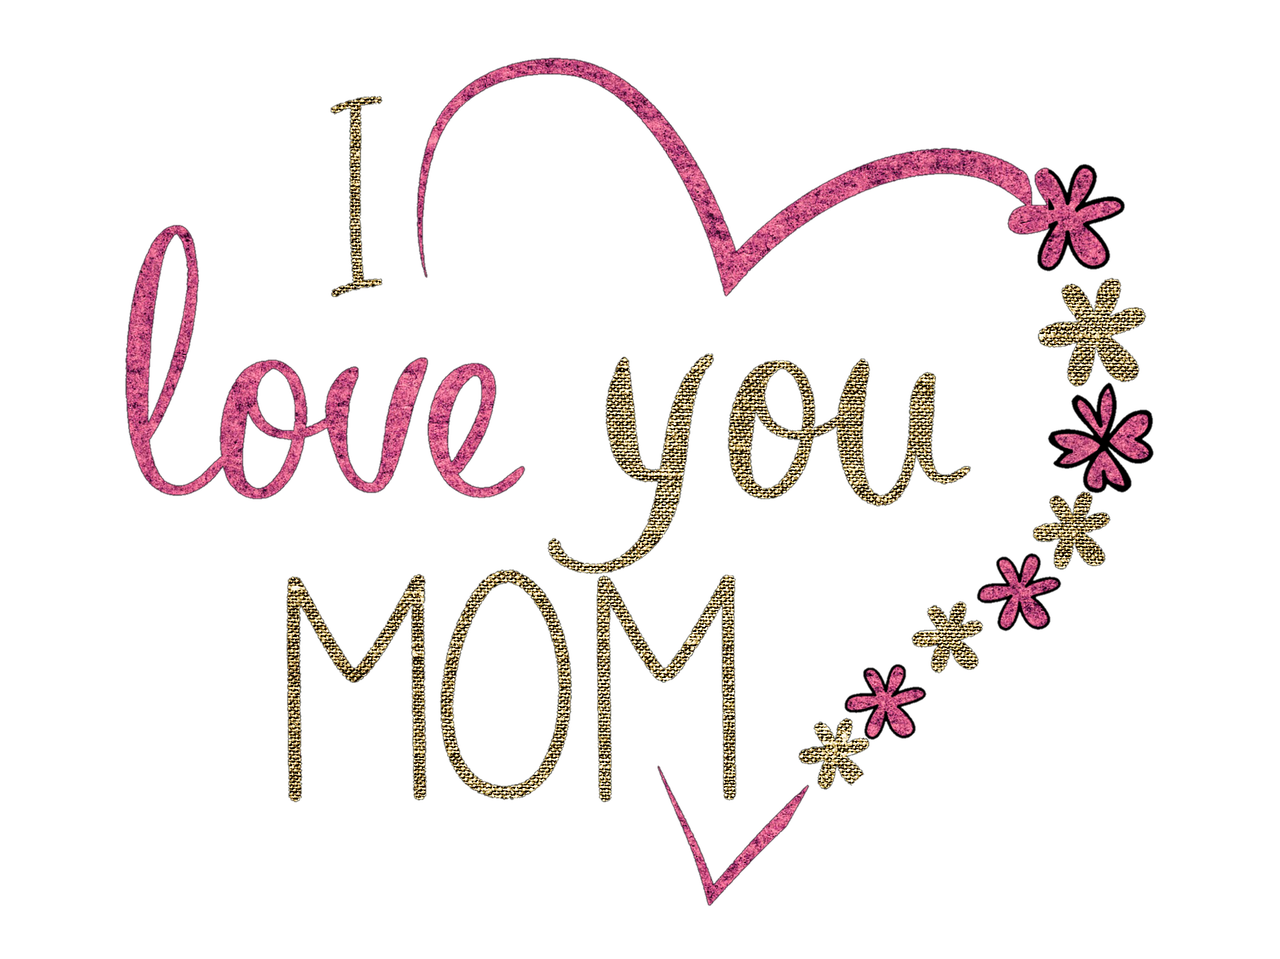 ¿Ya sabes cómo vas a festejar a mamá?